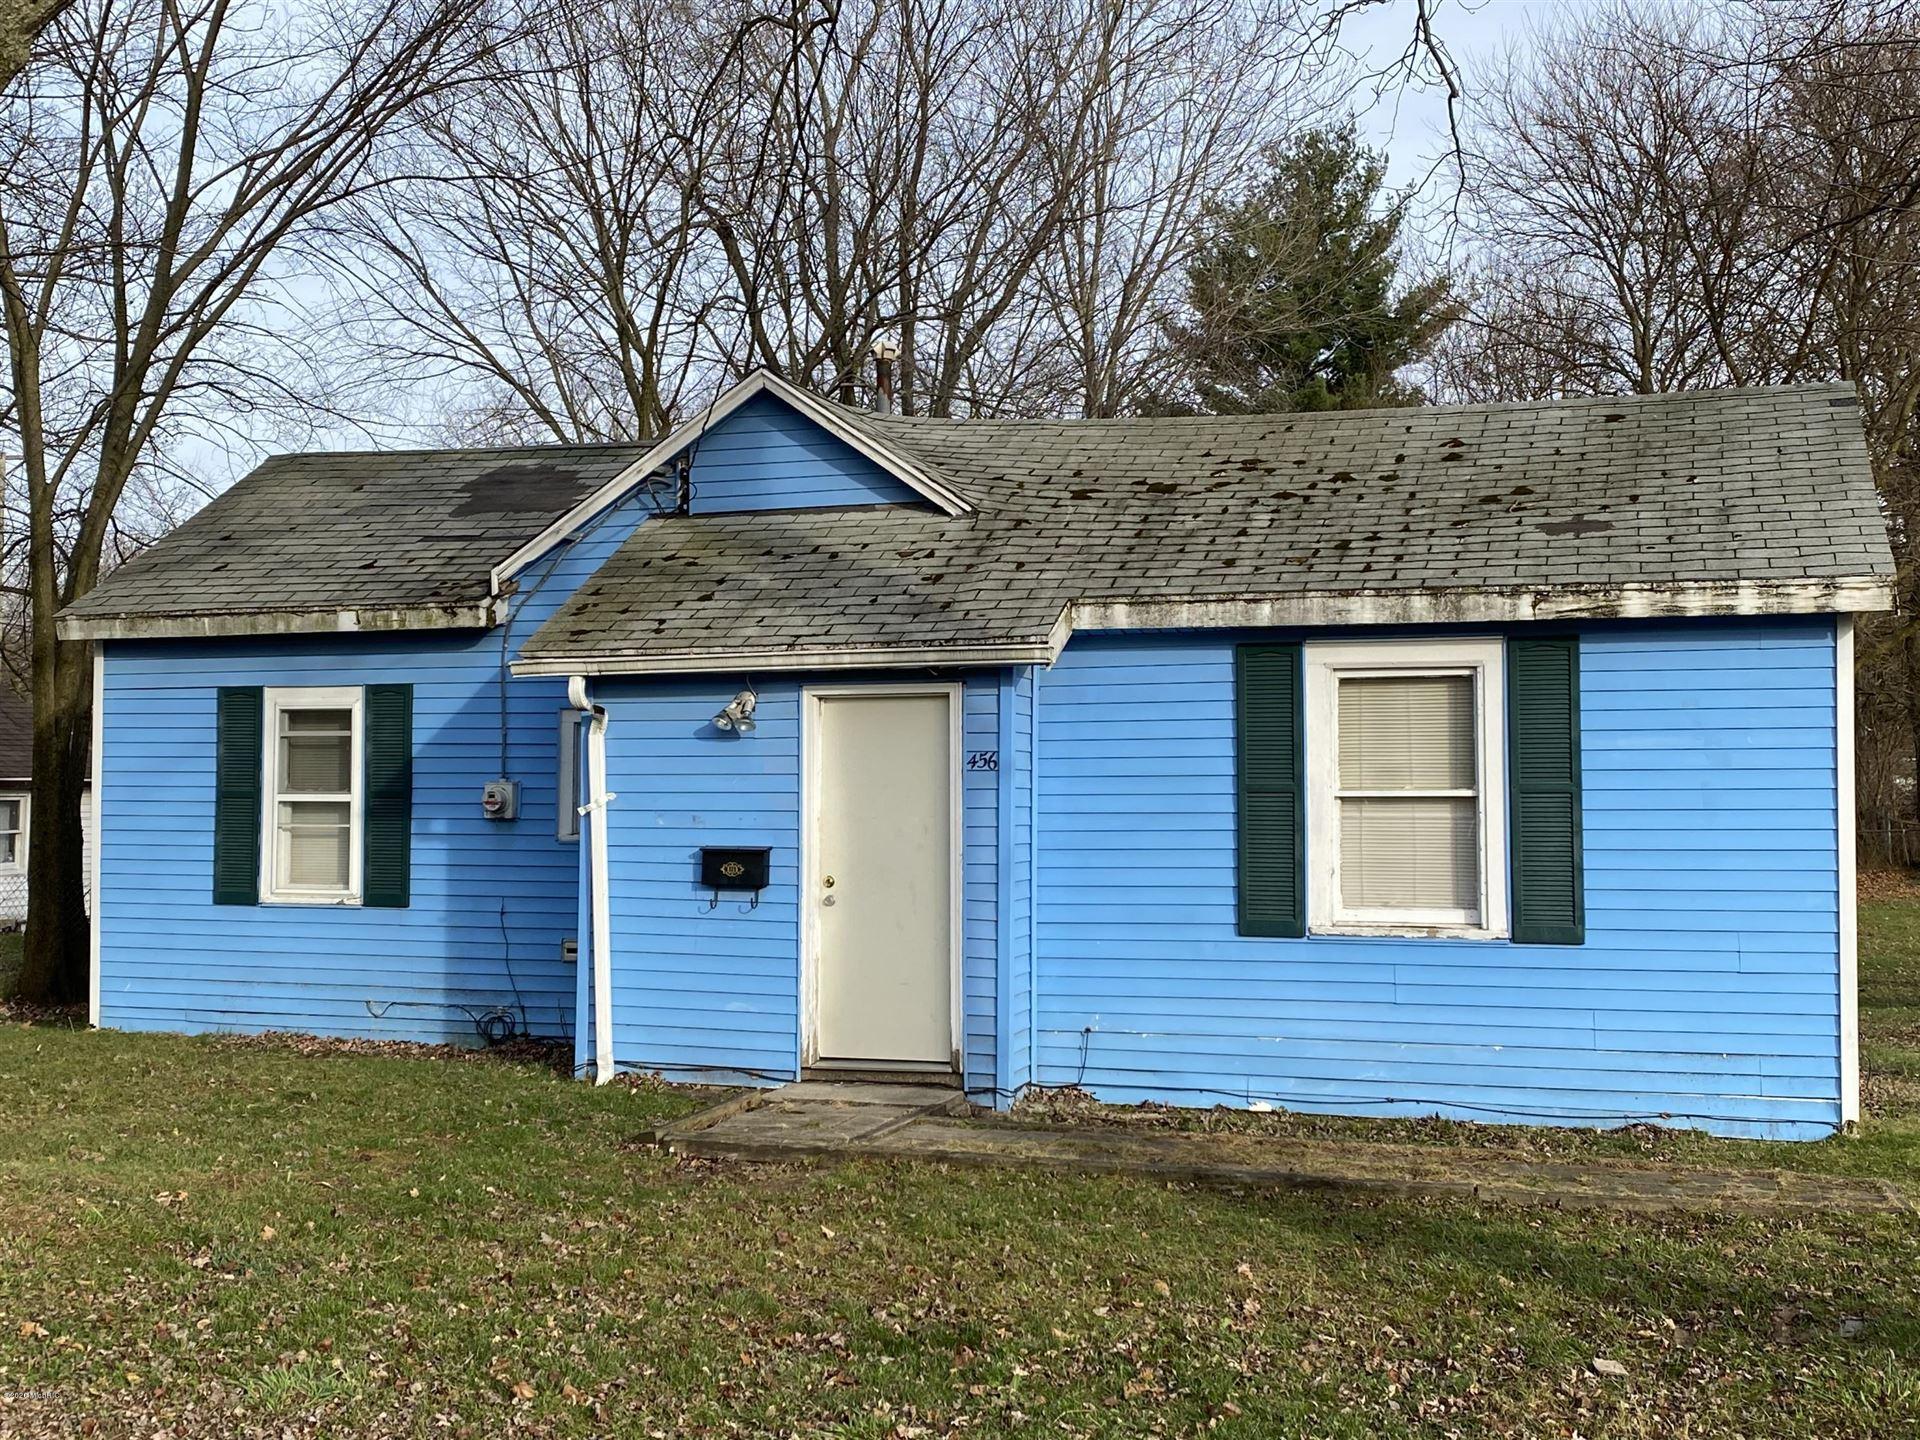 456 S Maple Street, Hartford, MI 49057 - MLS#: 20048228